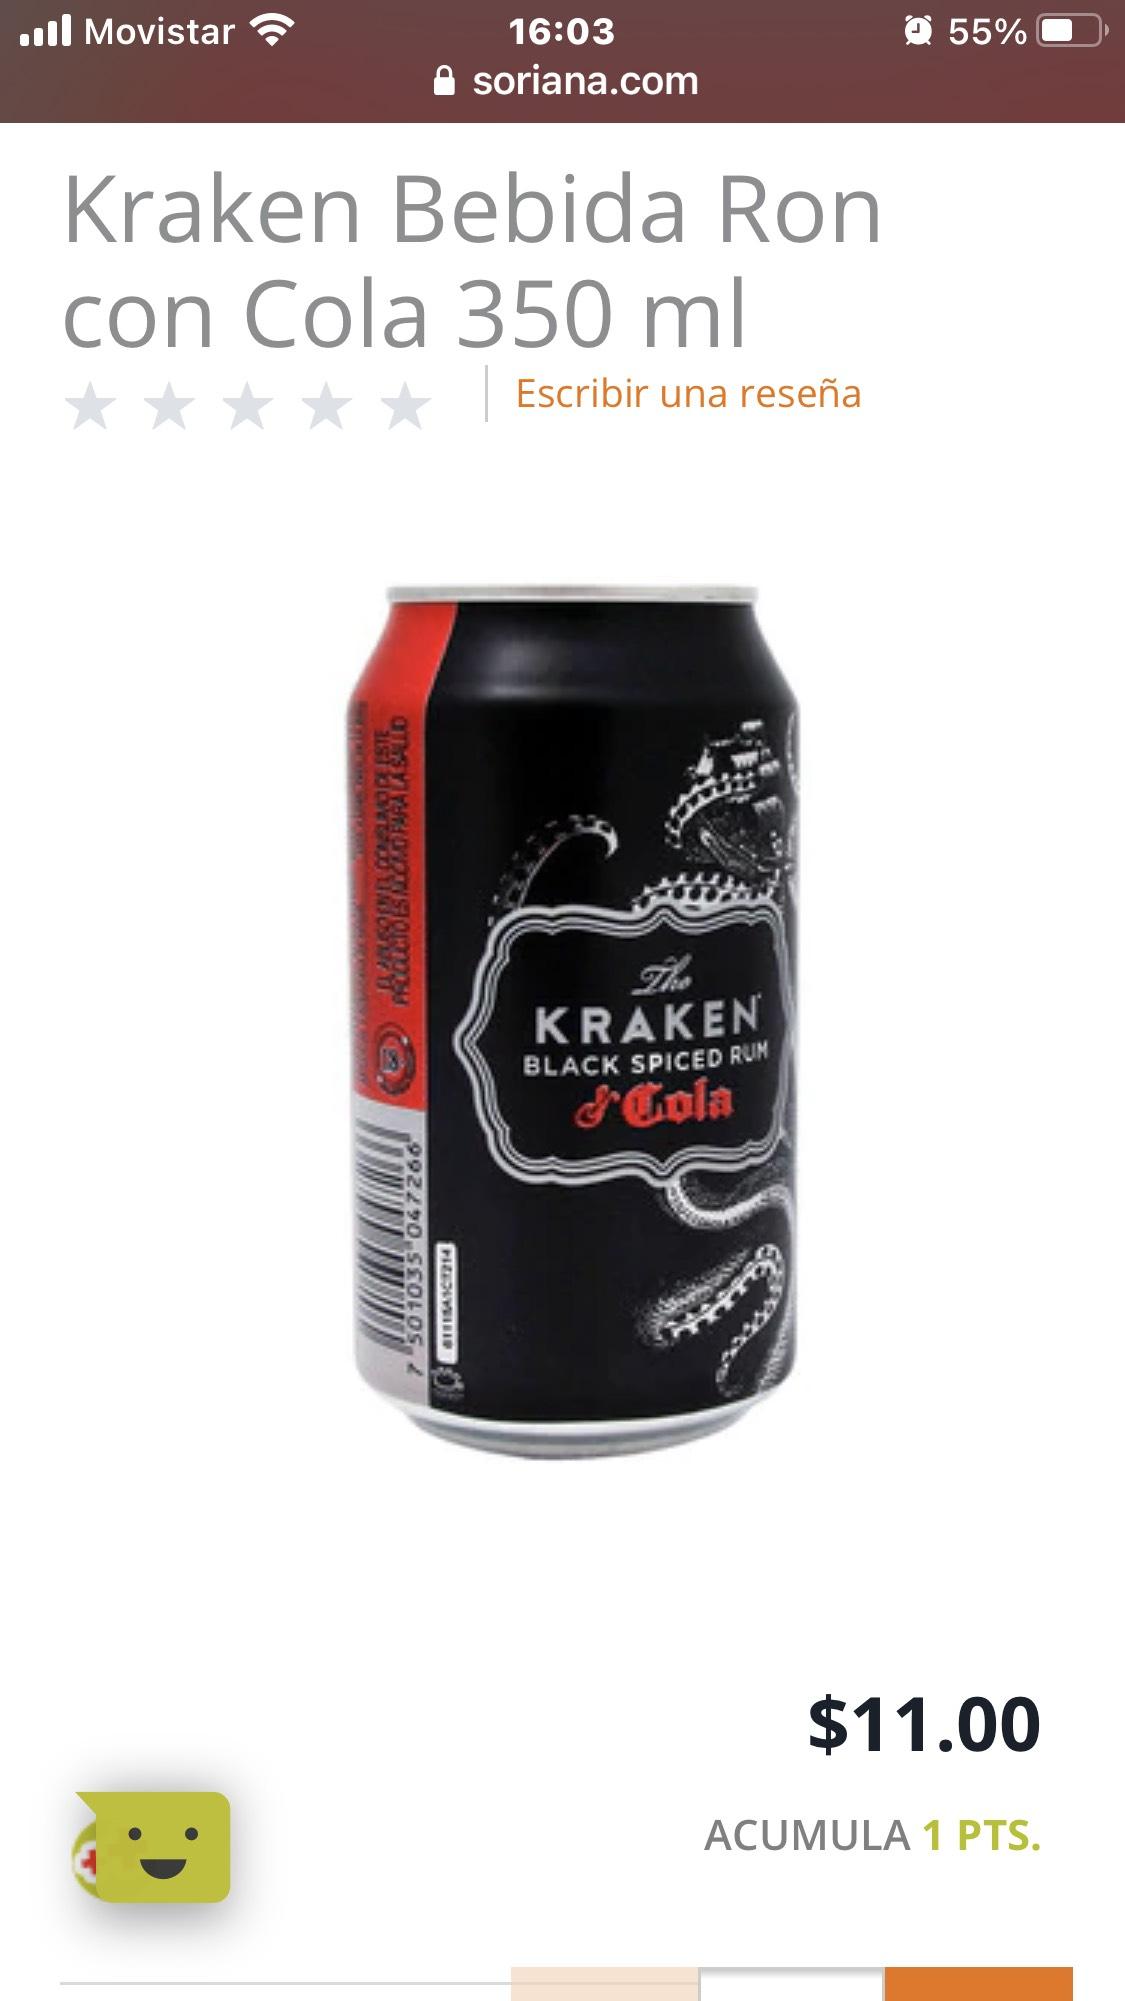 Soriana: Kraken bebida Ron con cola